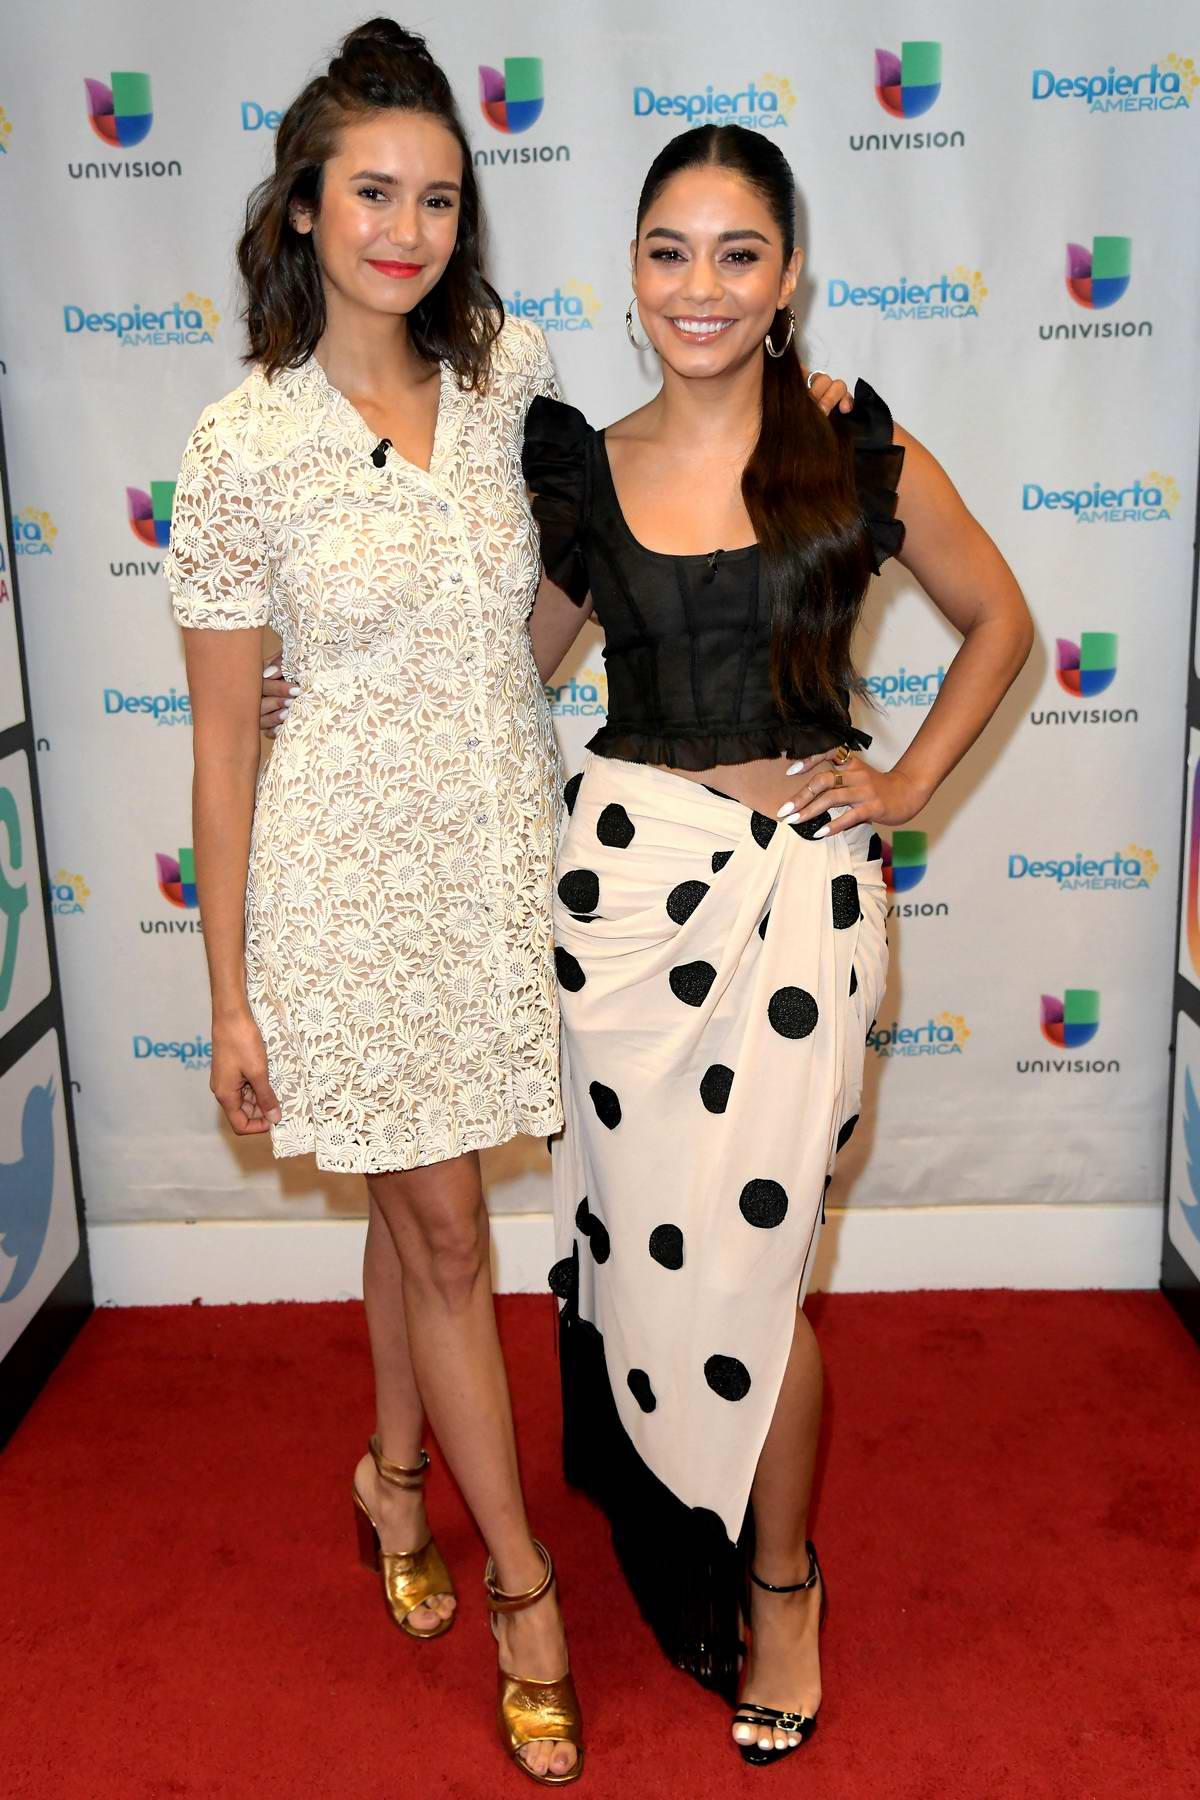 Nina Dobrev and Vanessa Hudgens makes an appearance on 'Despierta America' TV show in Miami, Florida